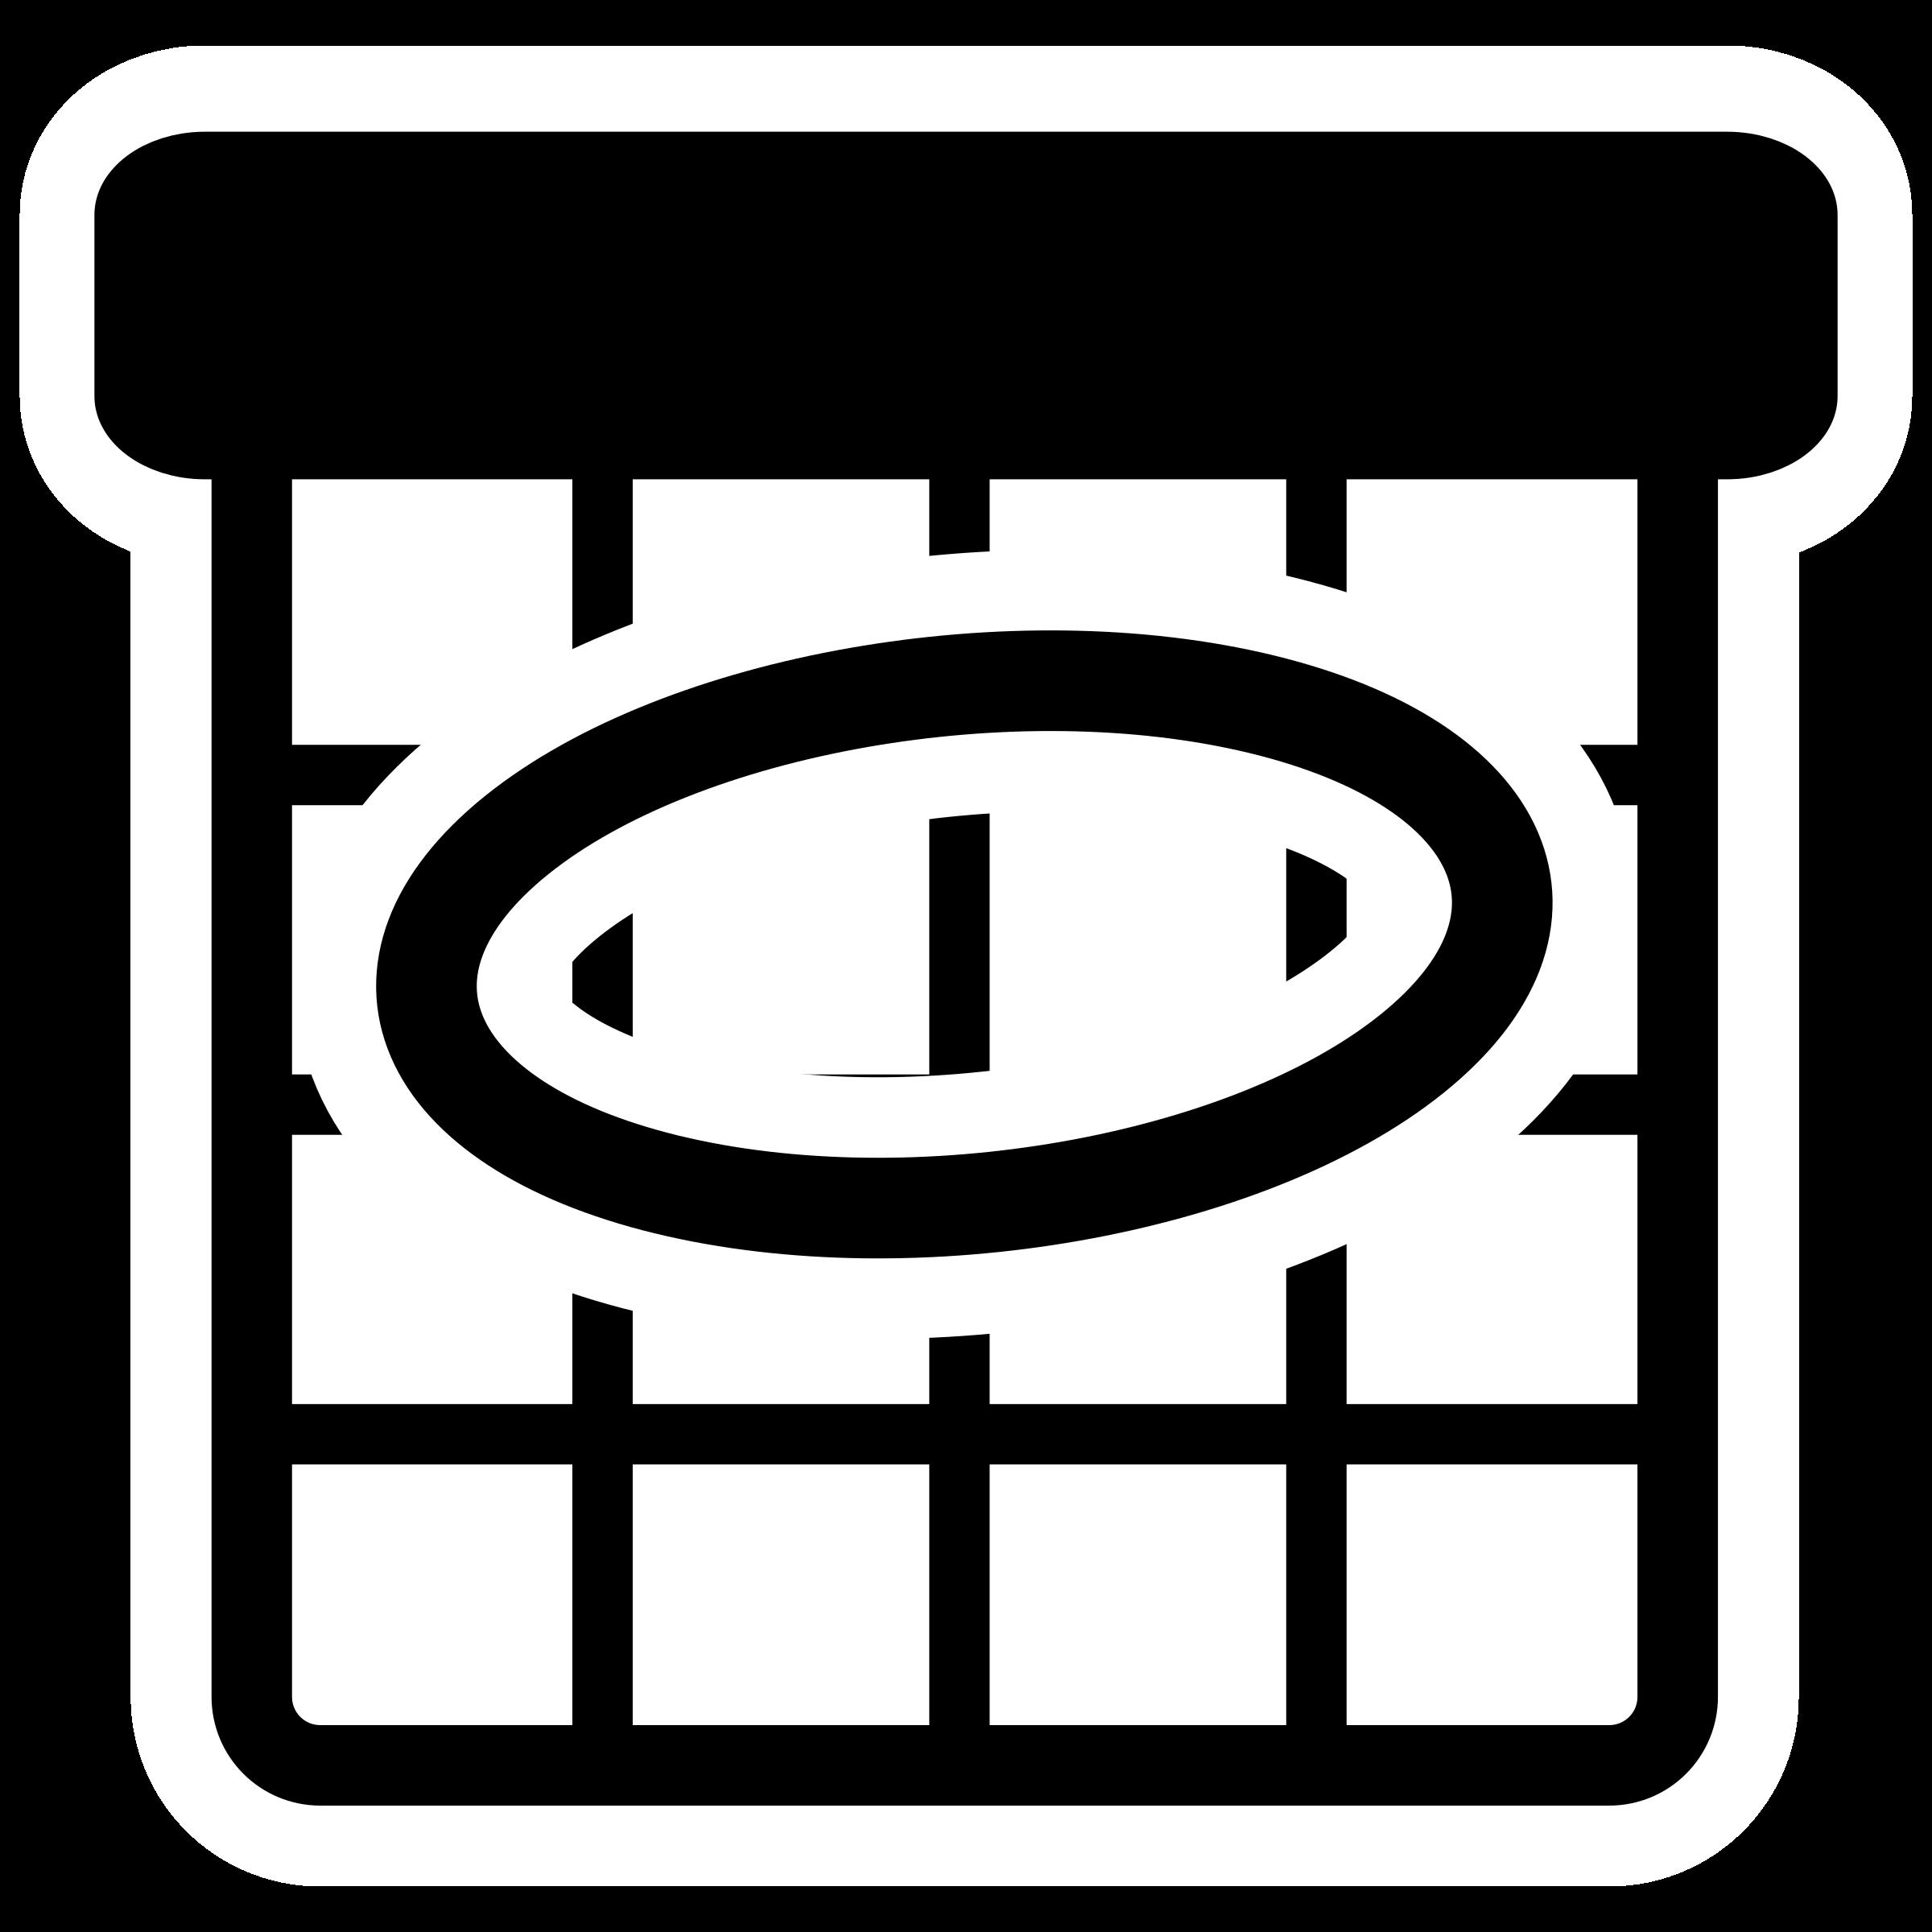 Cilpart super idea mono. Schedule clipart travel schedule